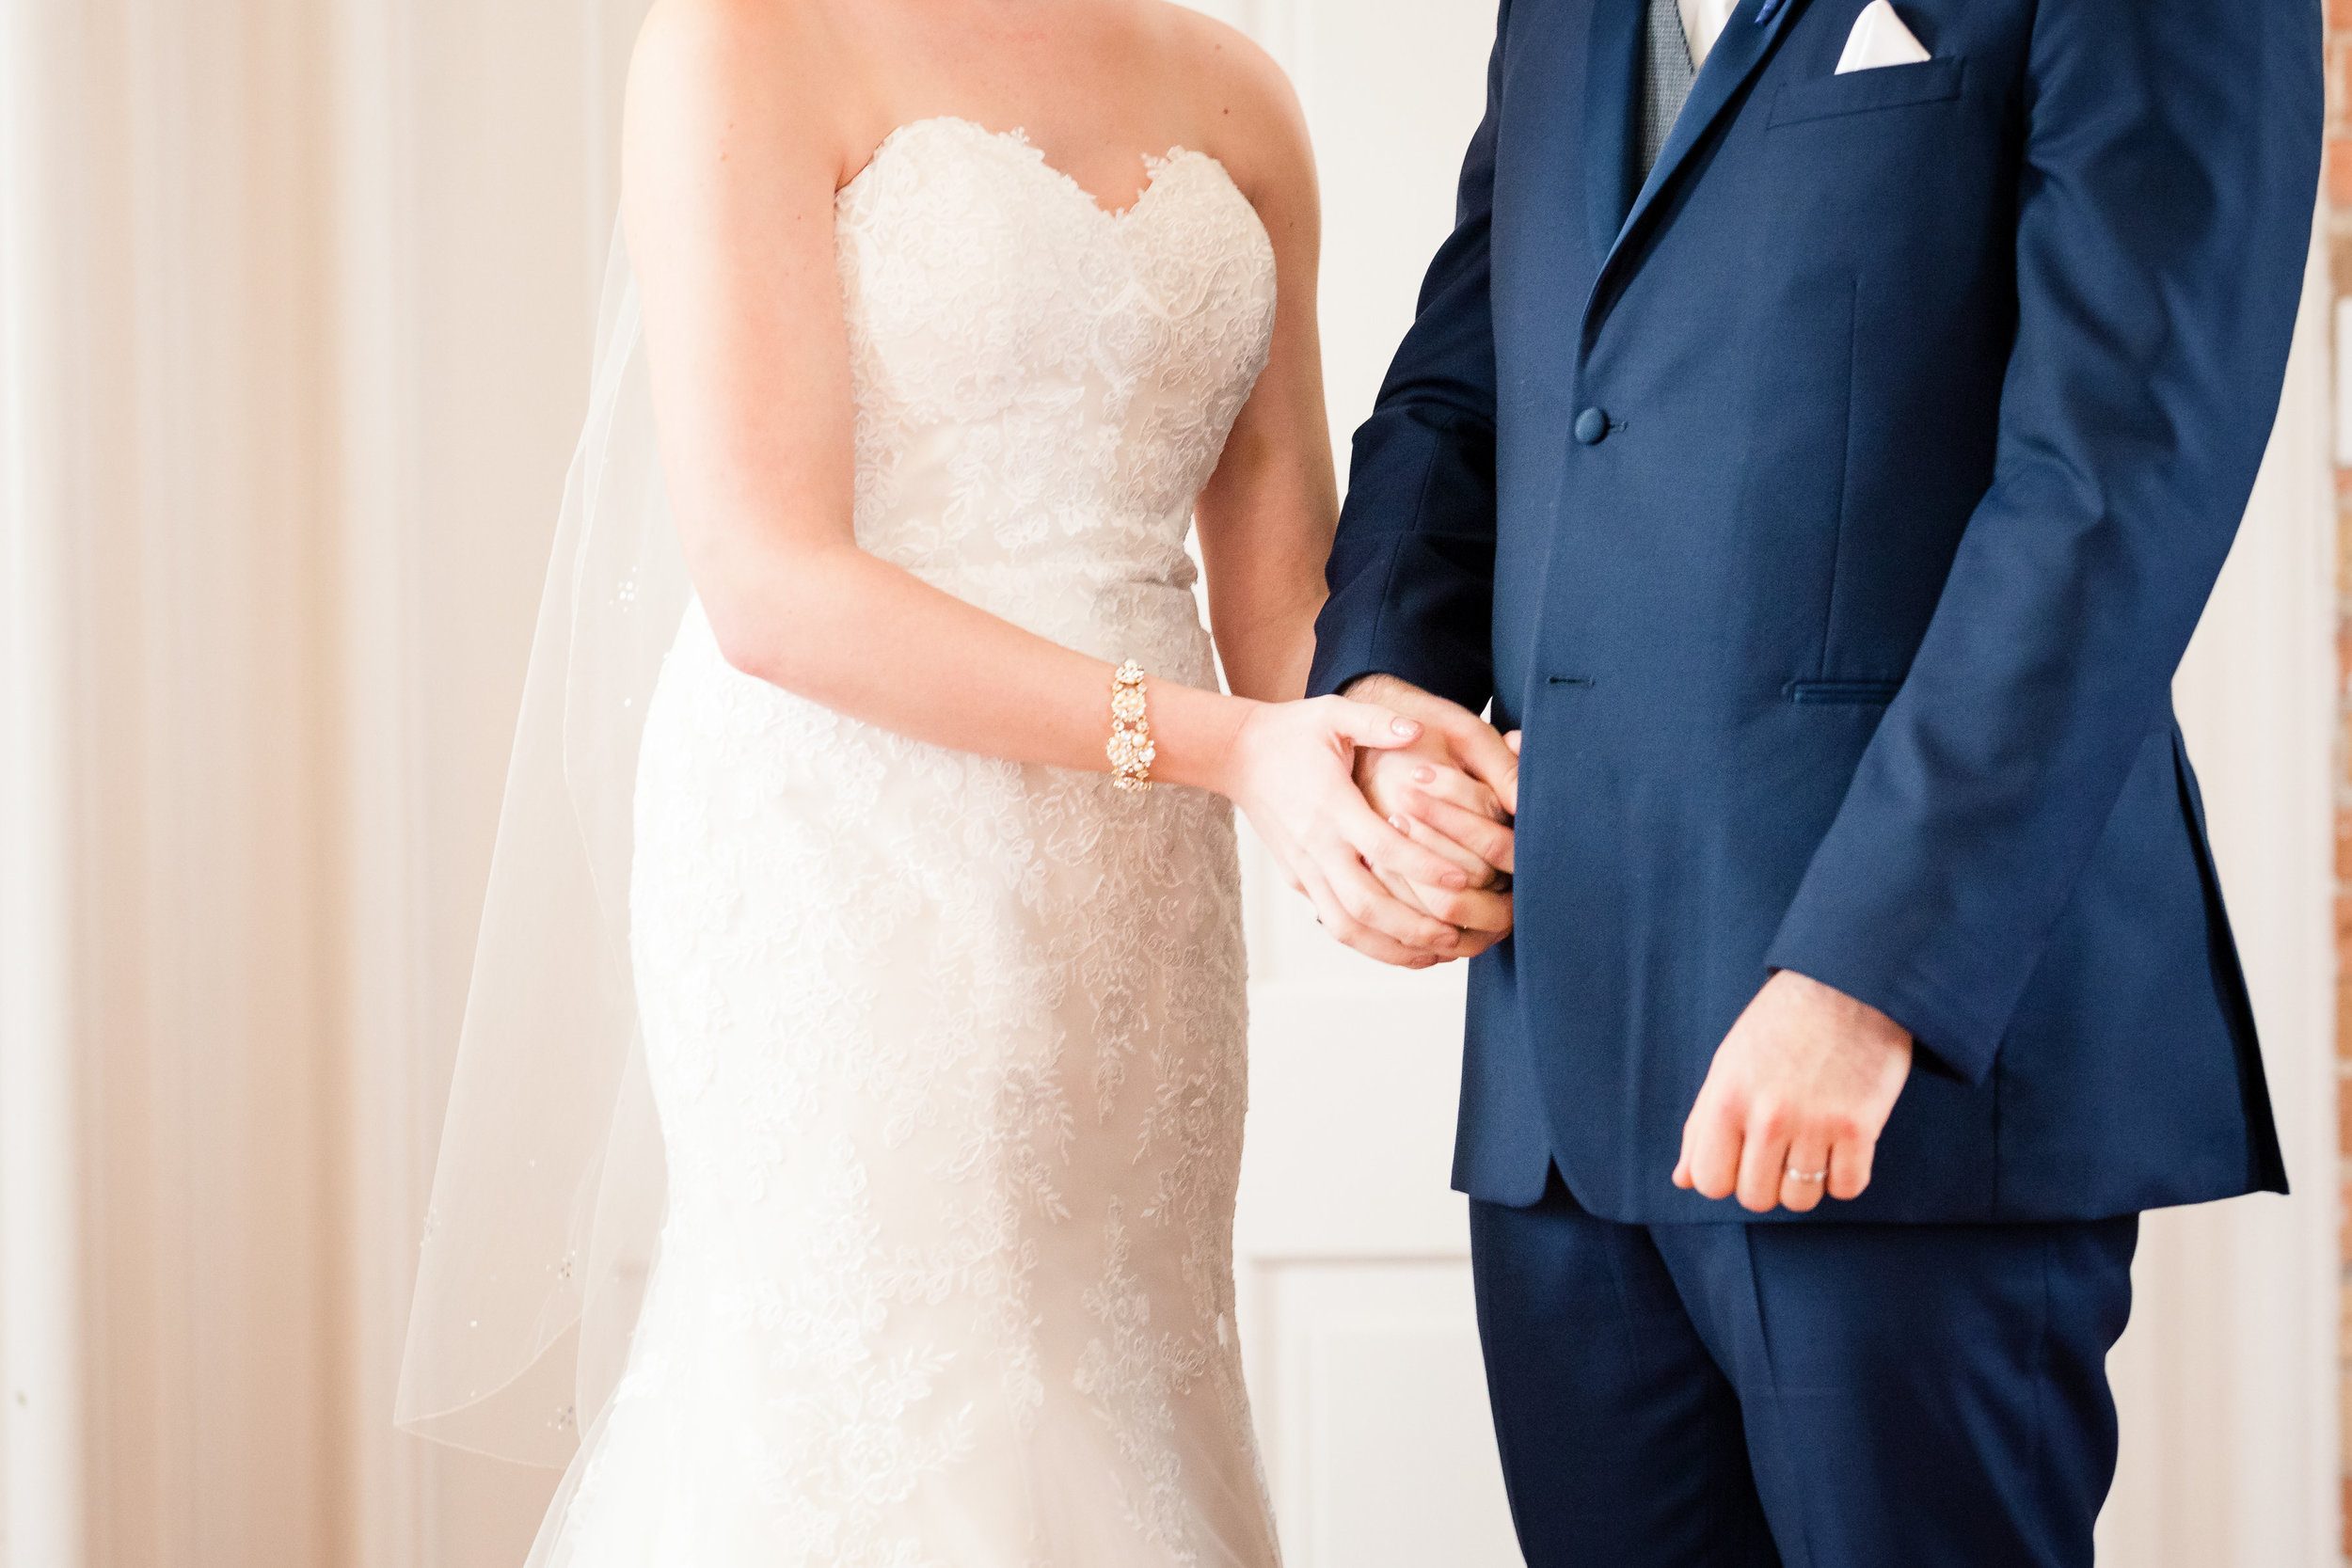 New Years Eve Wedding Blog Bridal Shop Wedding Dresses London Ontario,Wedding Dress Netting Fabric